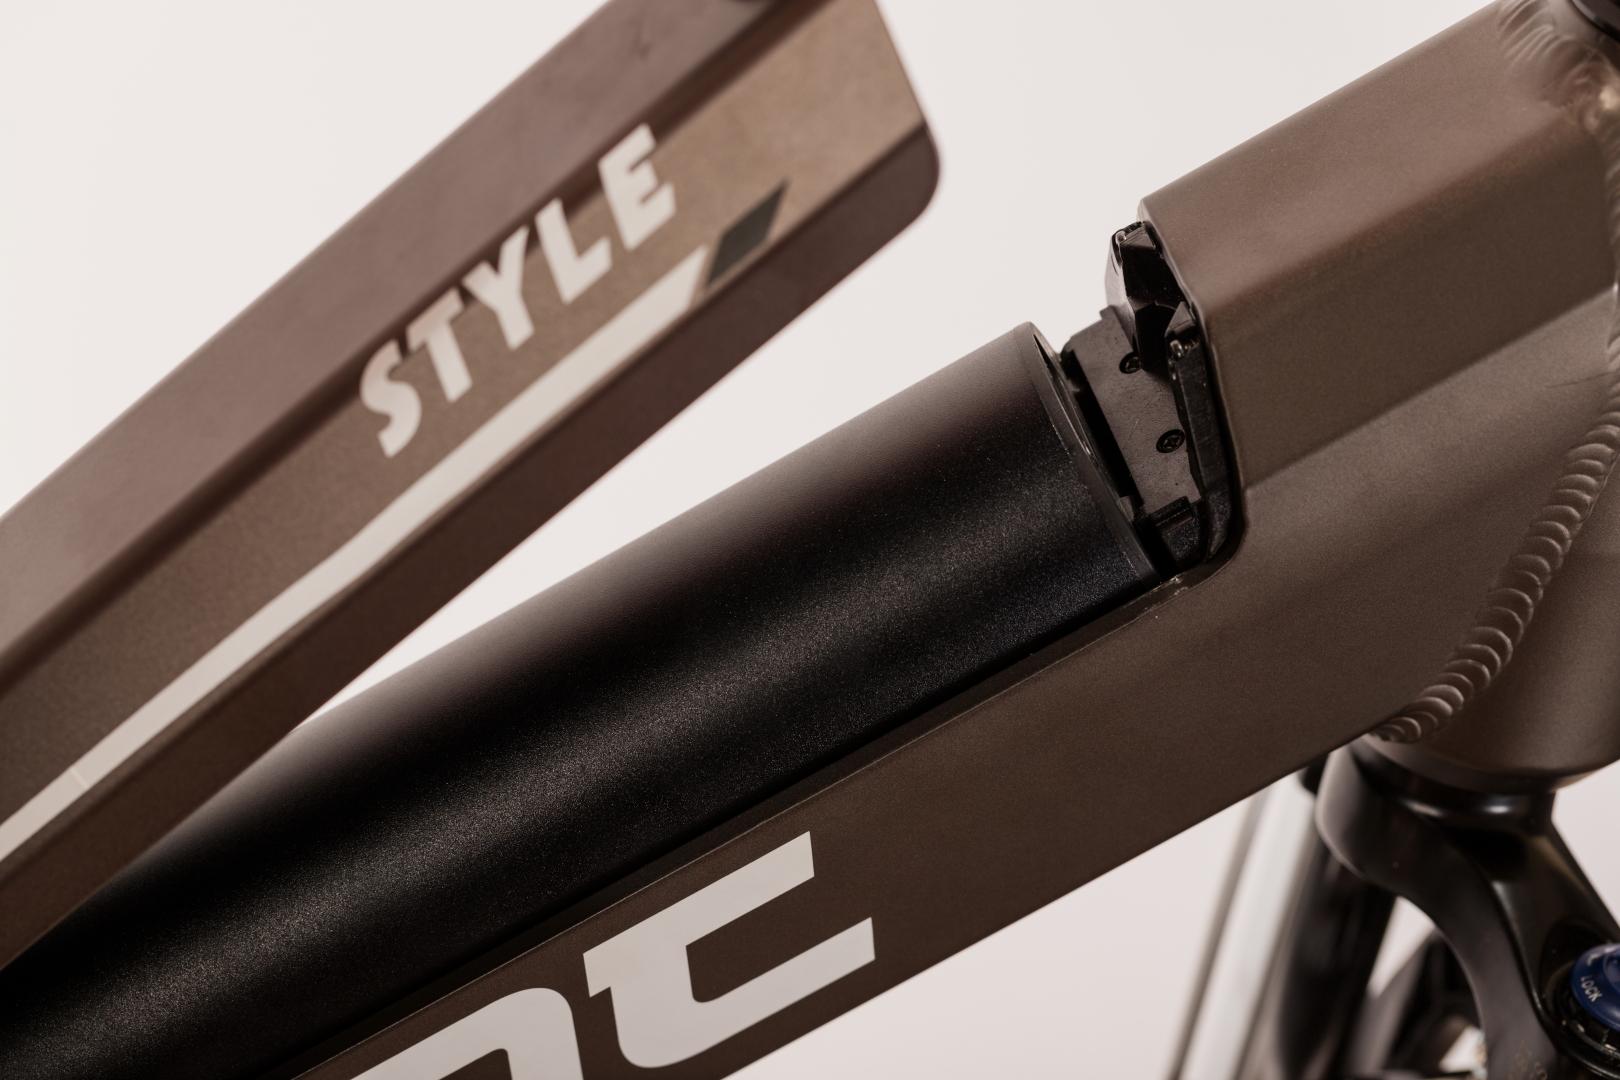 STYLE 700C bike image